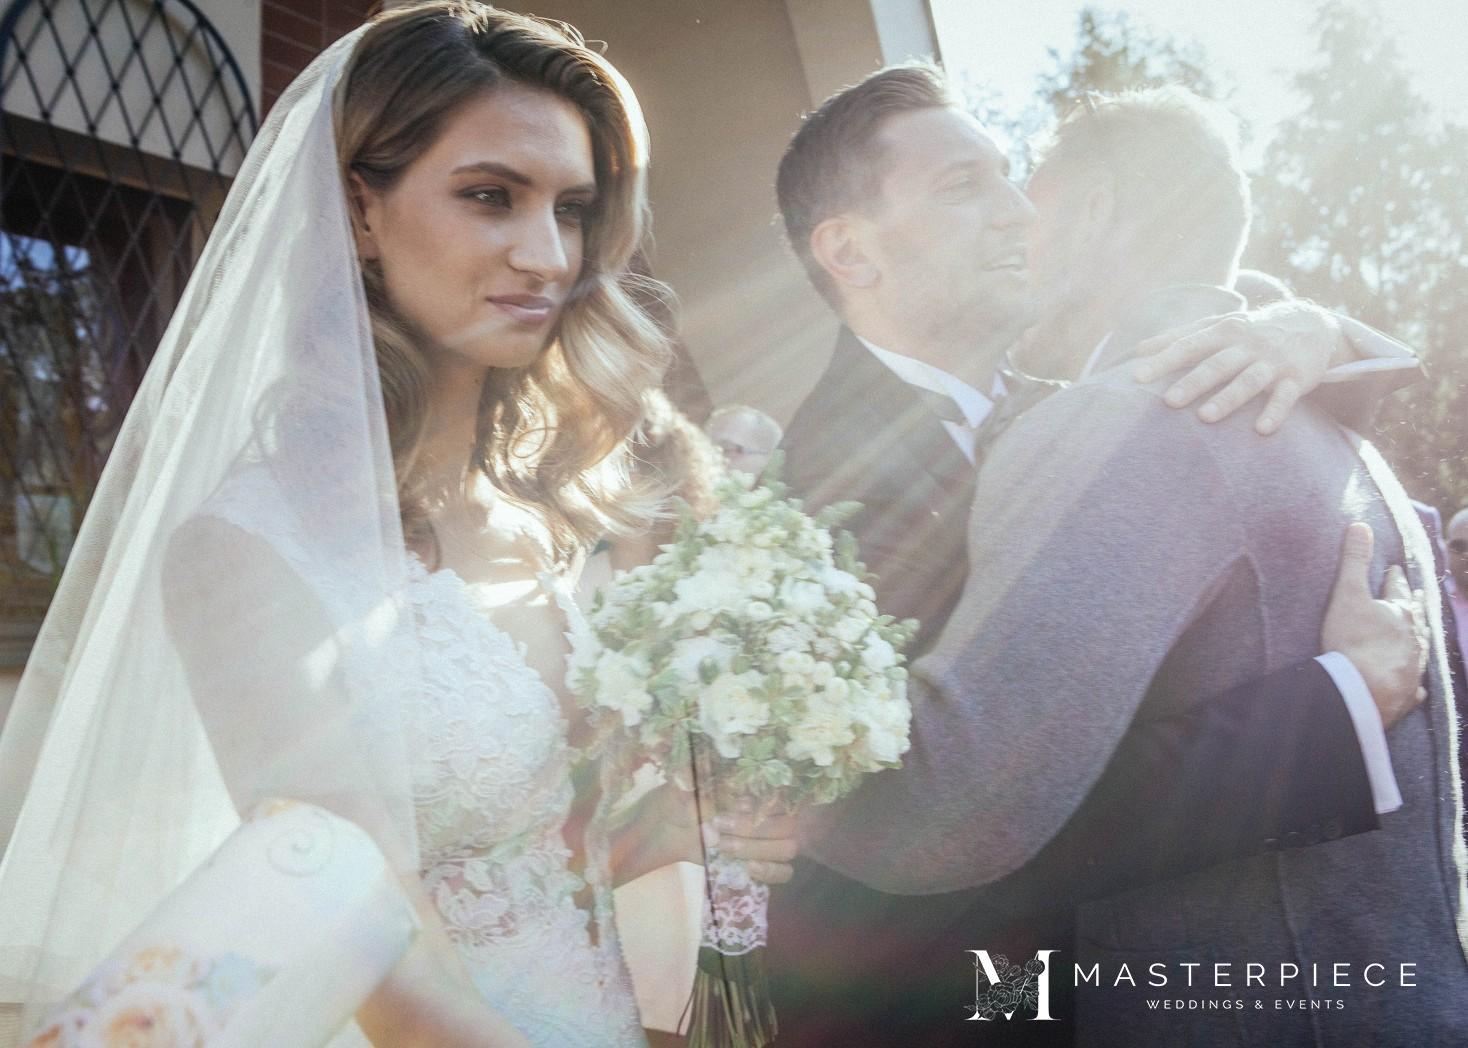 Masterpiece_Weddings_sluby_067